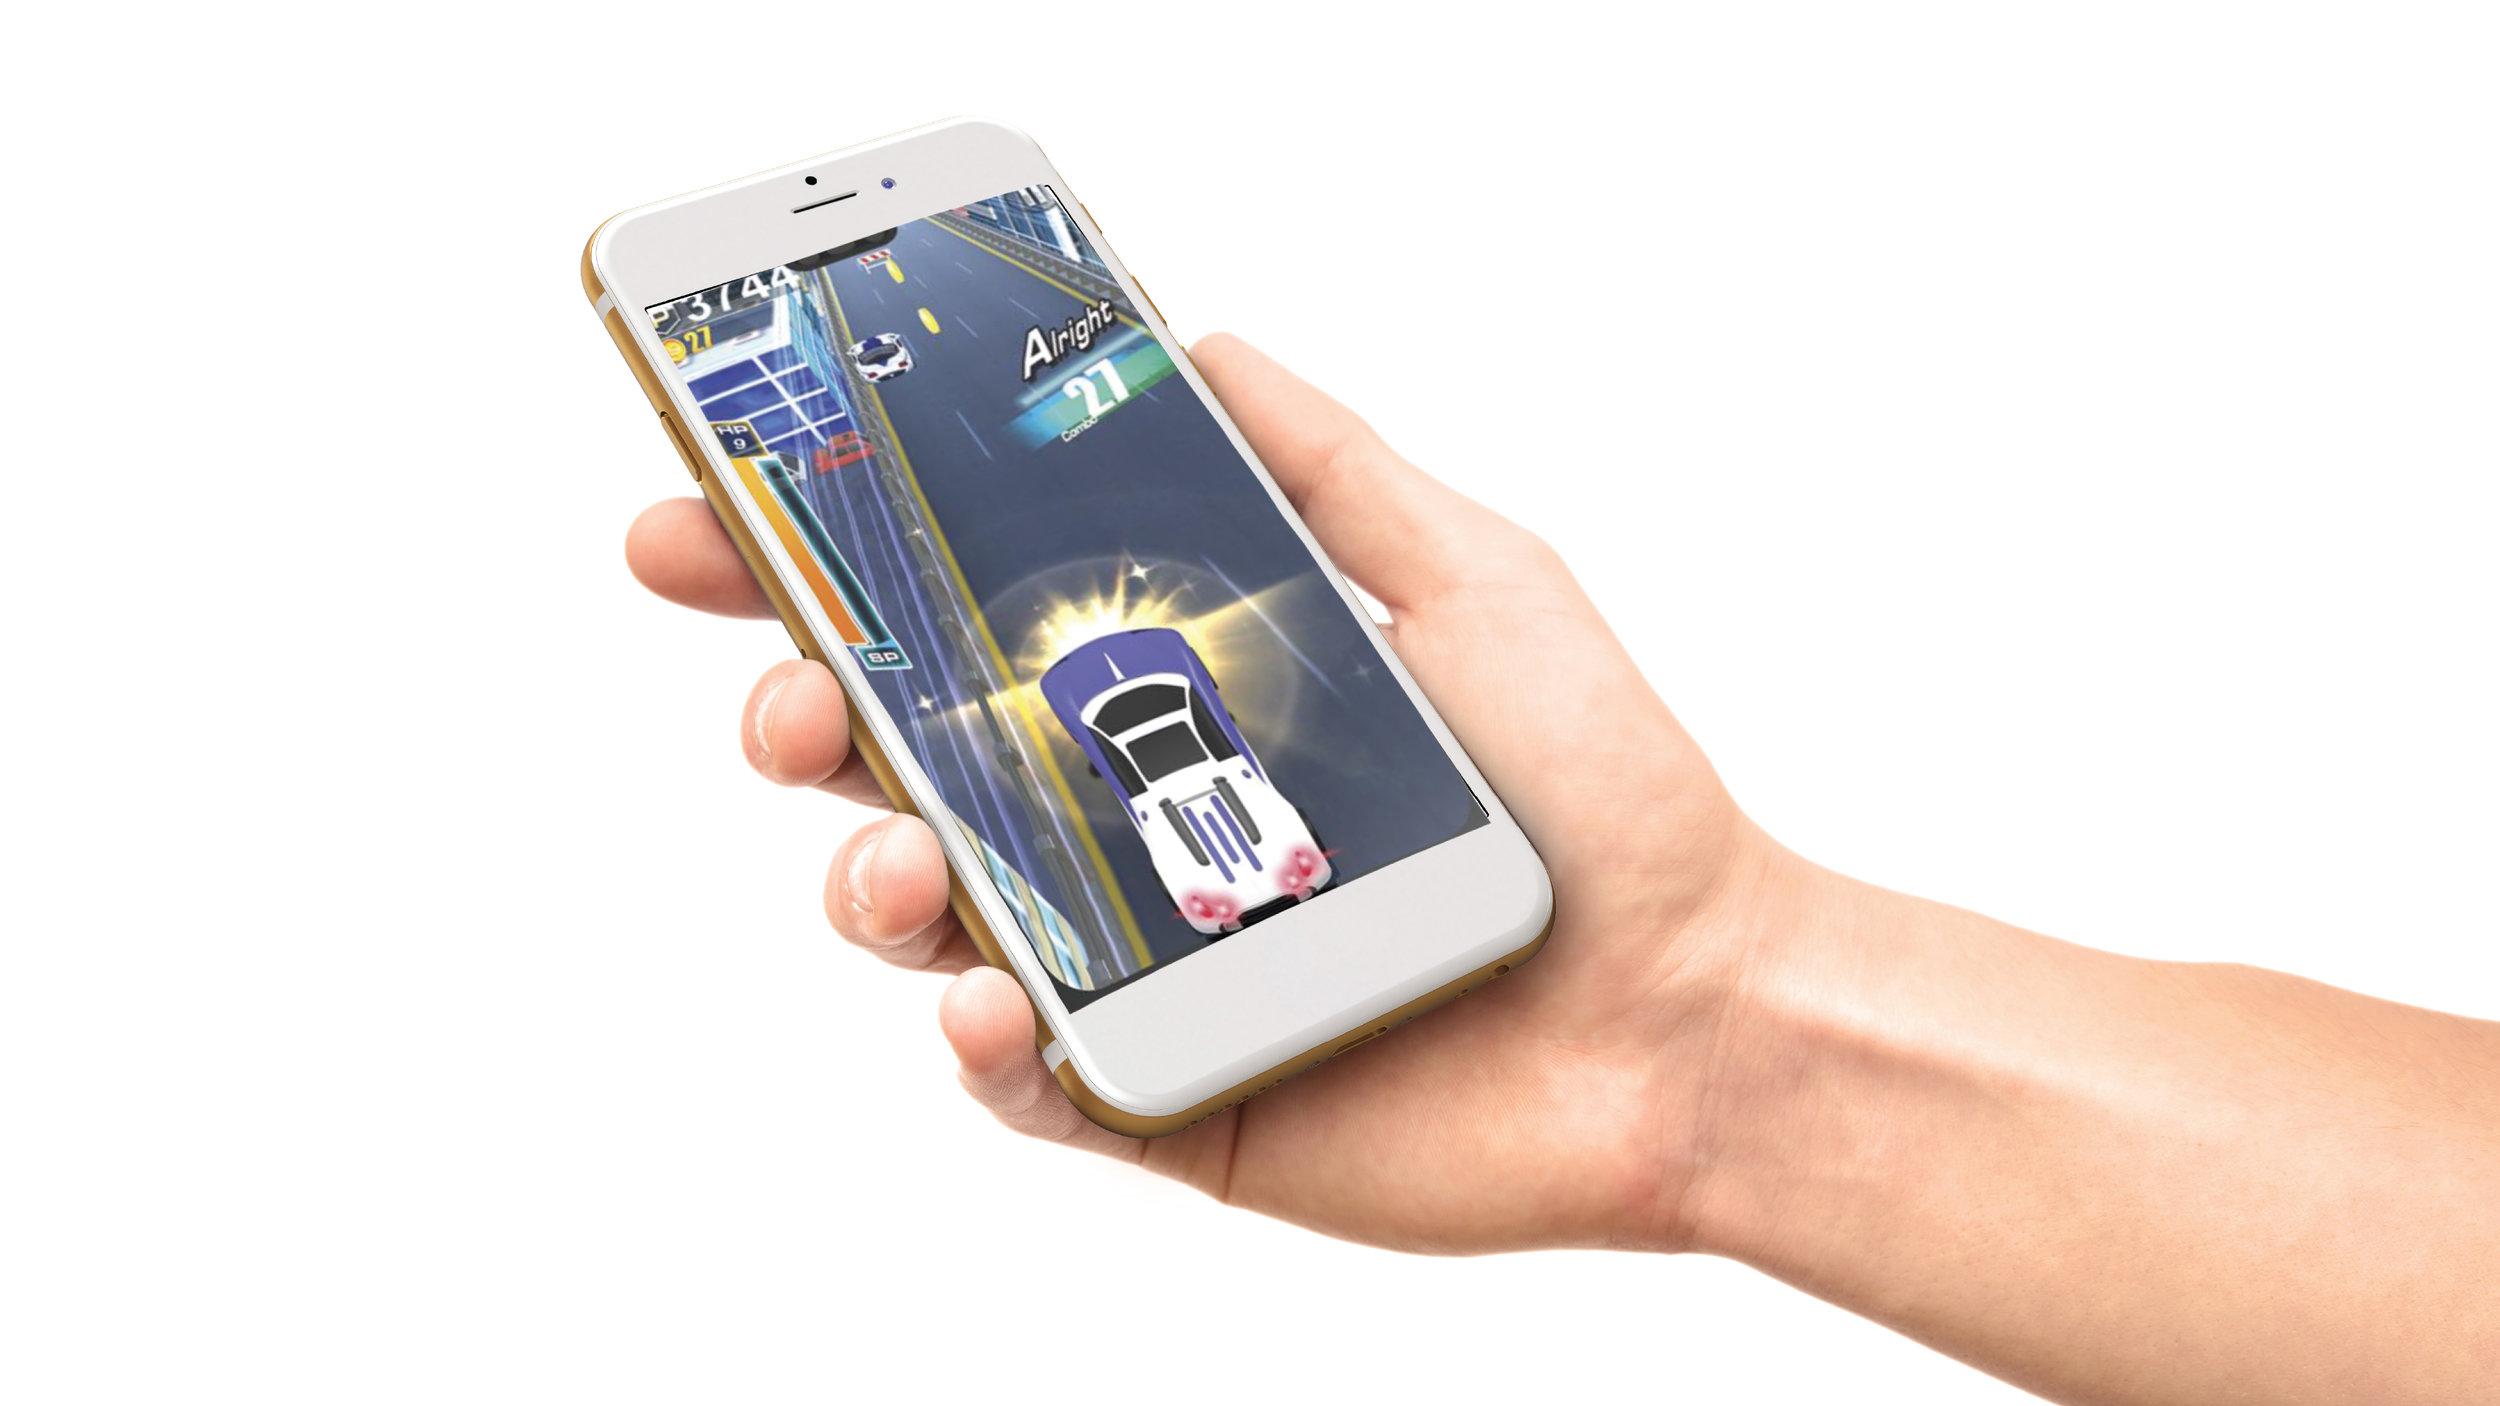 Activ Racer Image 1.jpg